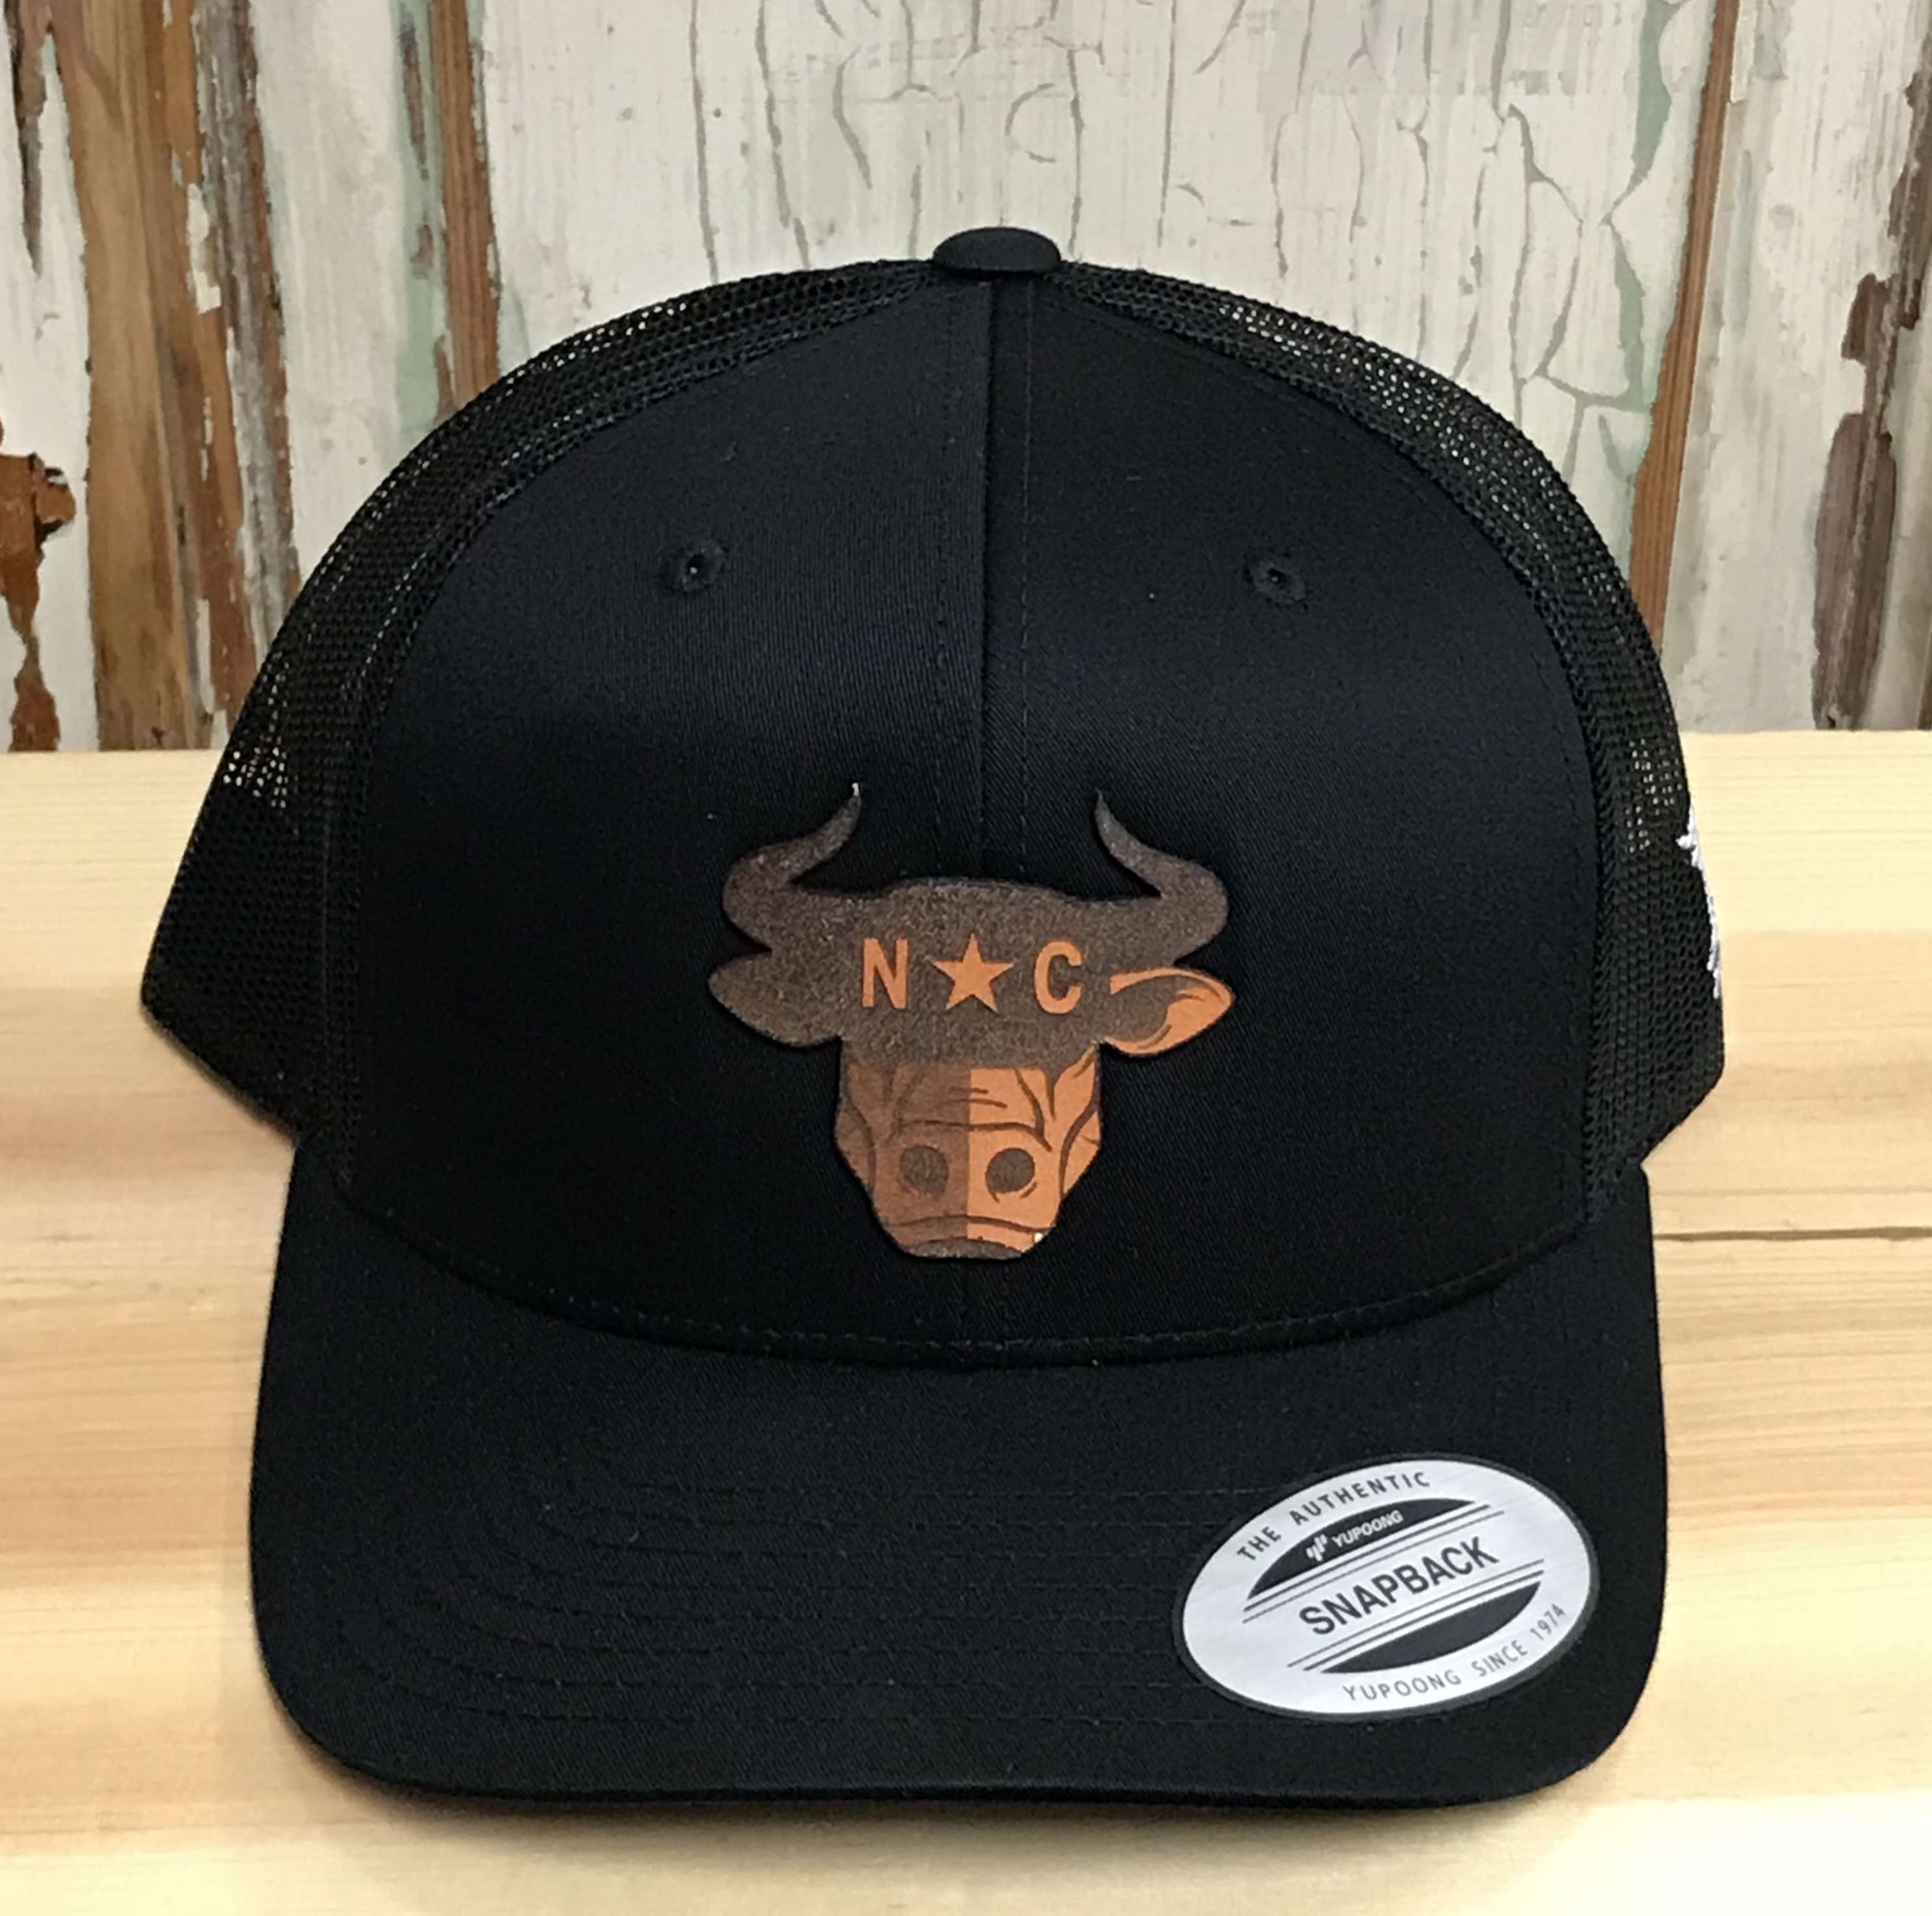 Branded Bills North Carolina Bull City Leather Patch Snapback Trucker Hat Black/Black Accessories, Headwear,